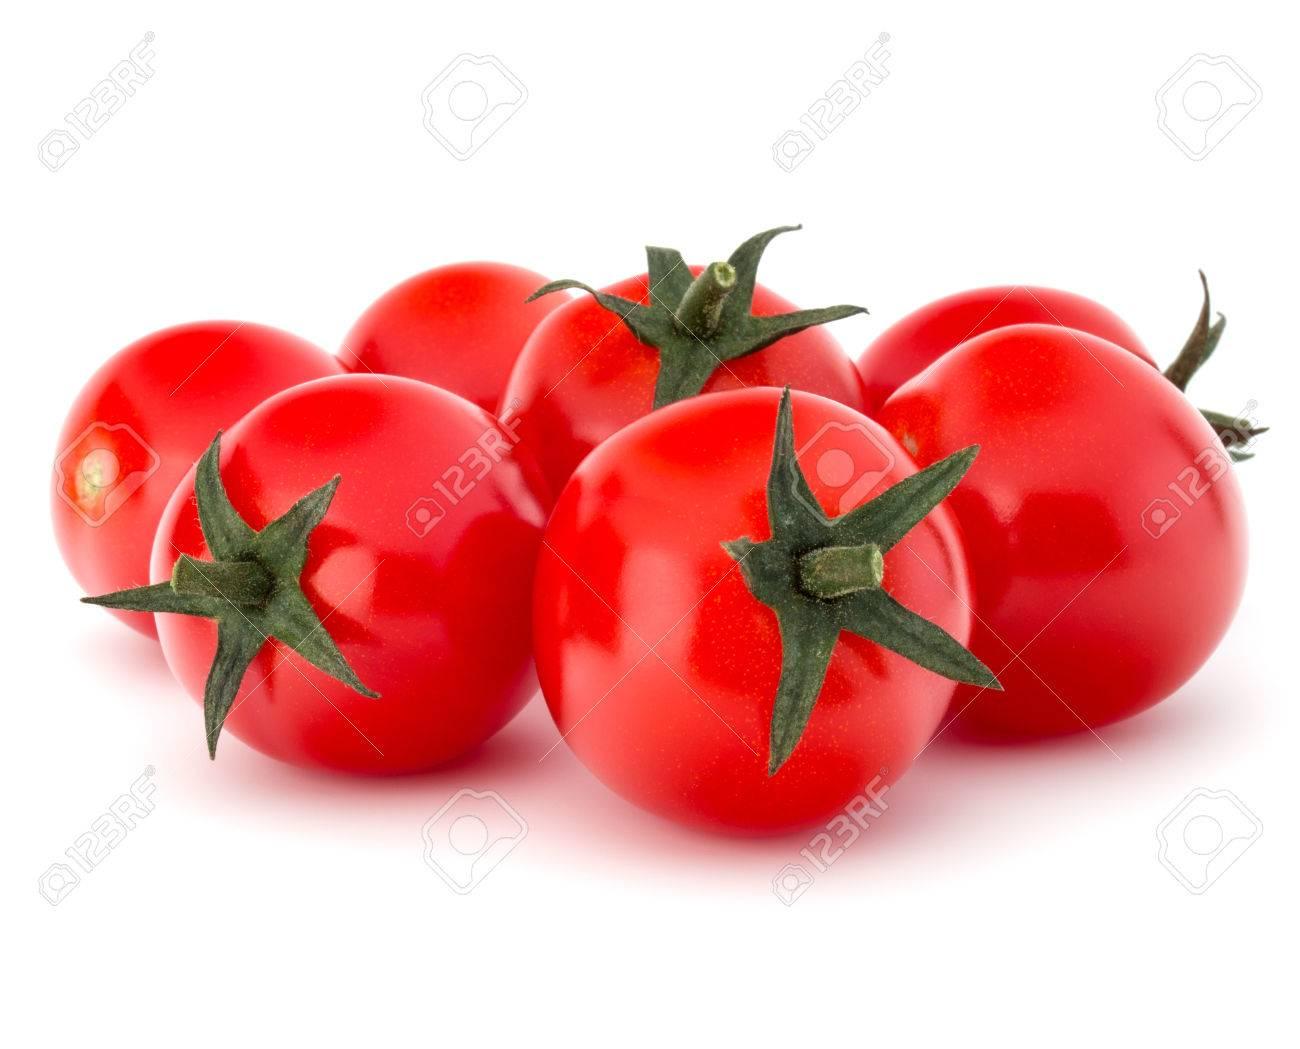 fresh cherry tomato isolated on white background cutout - 51635254